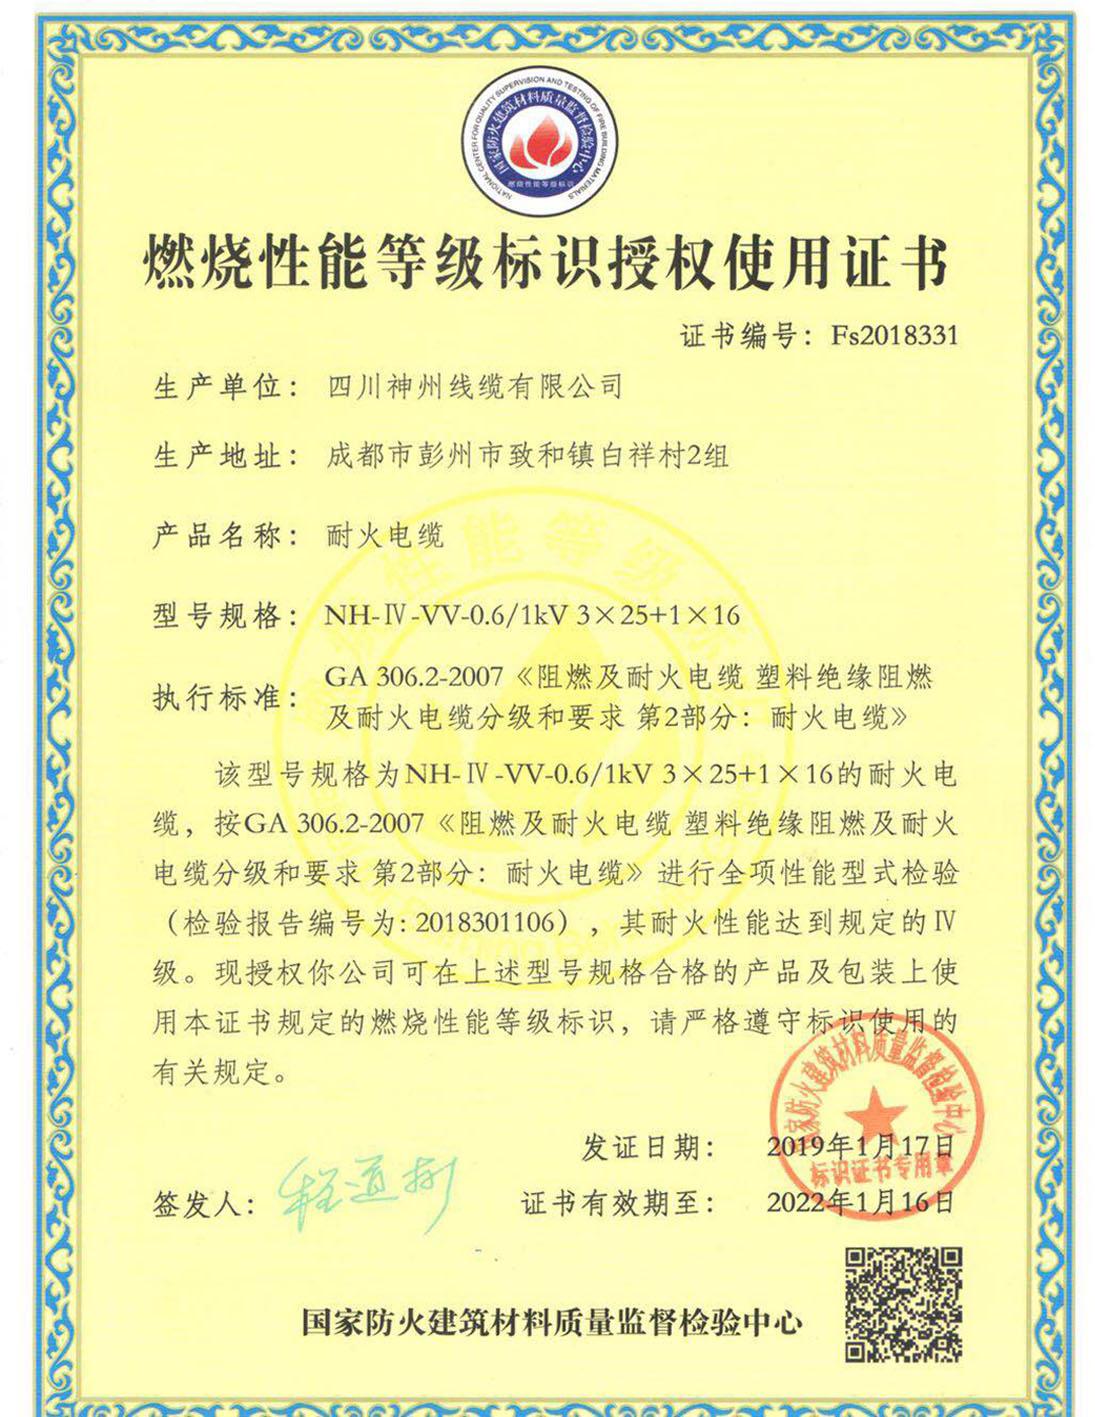 P好证书-e9976c18-1af2-4bb4-94cf-e0c0538f1747